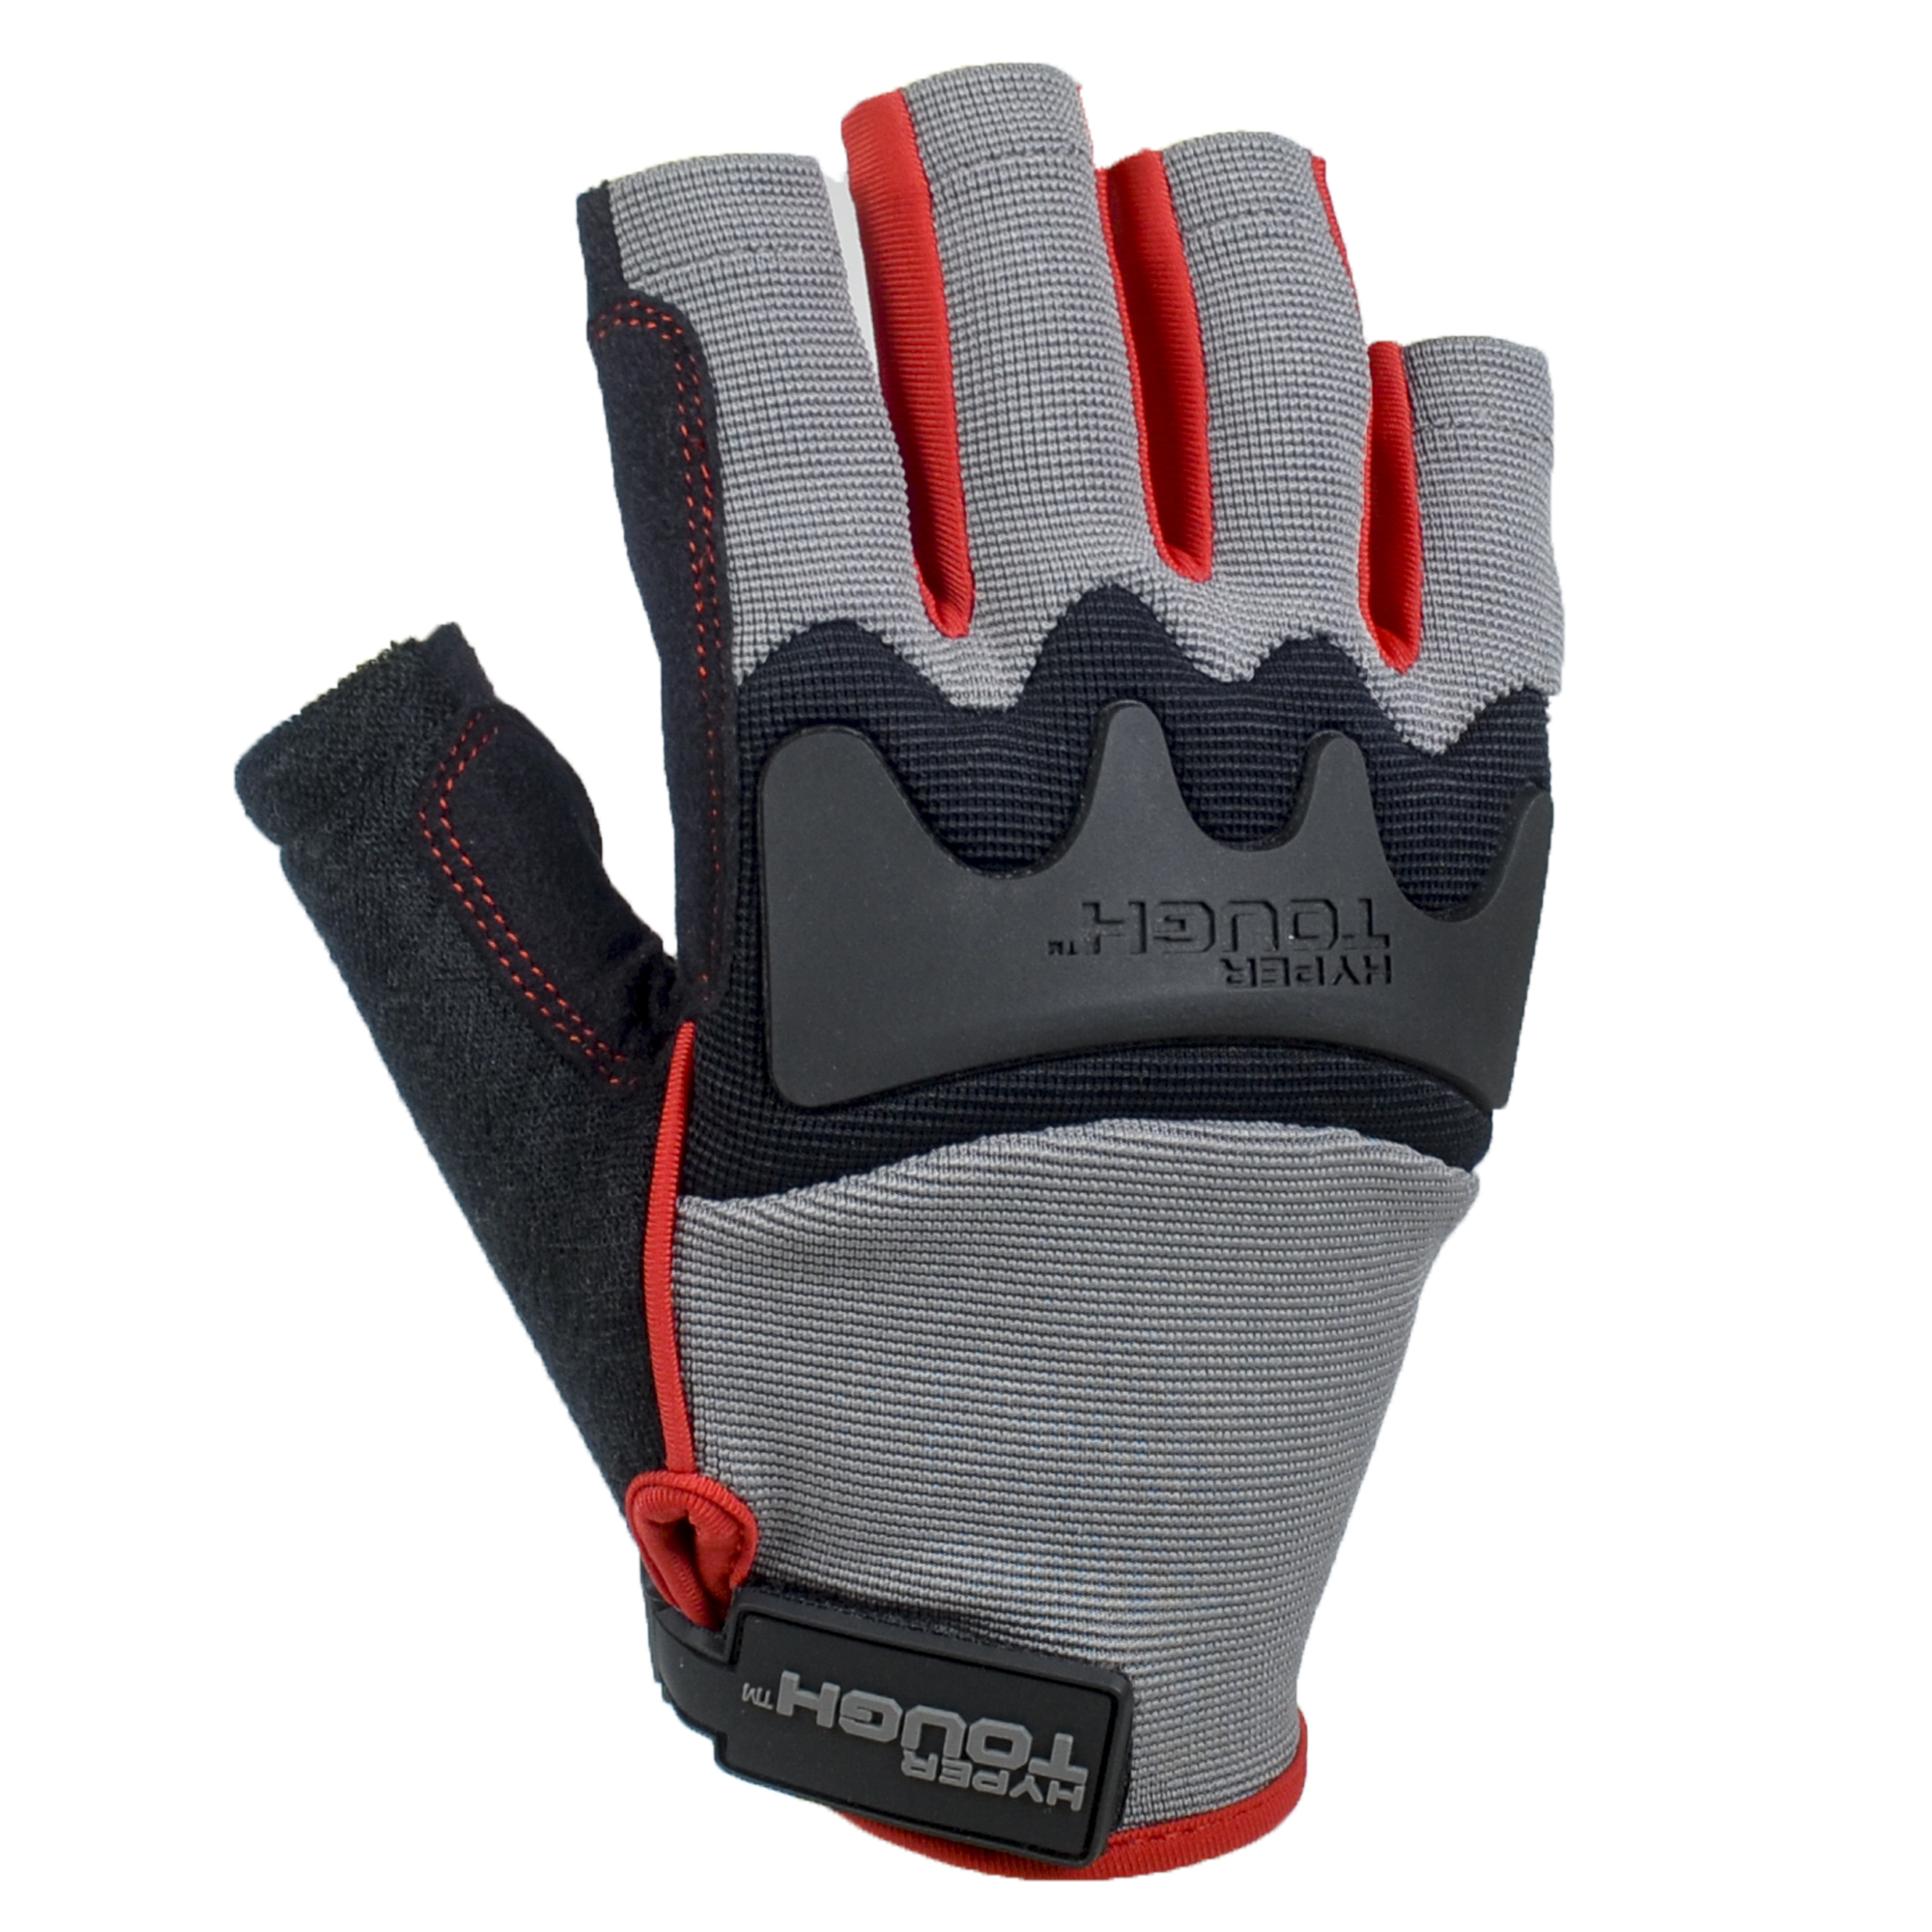 Hyper Tough Fingerless Glove Large